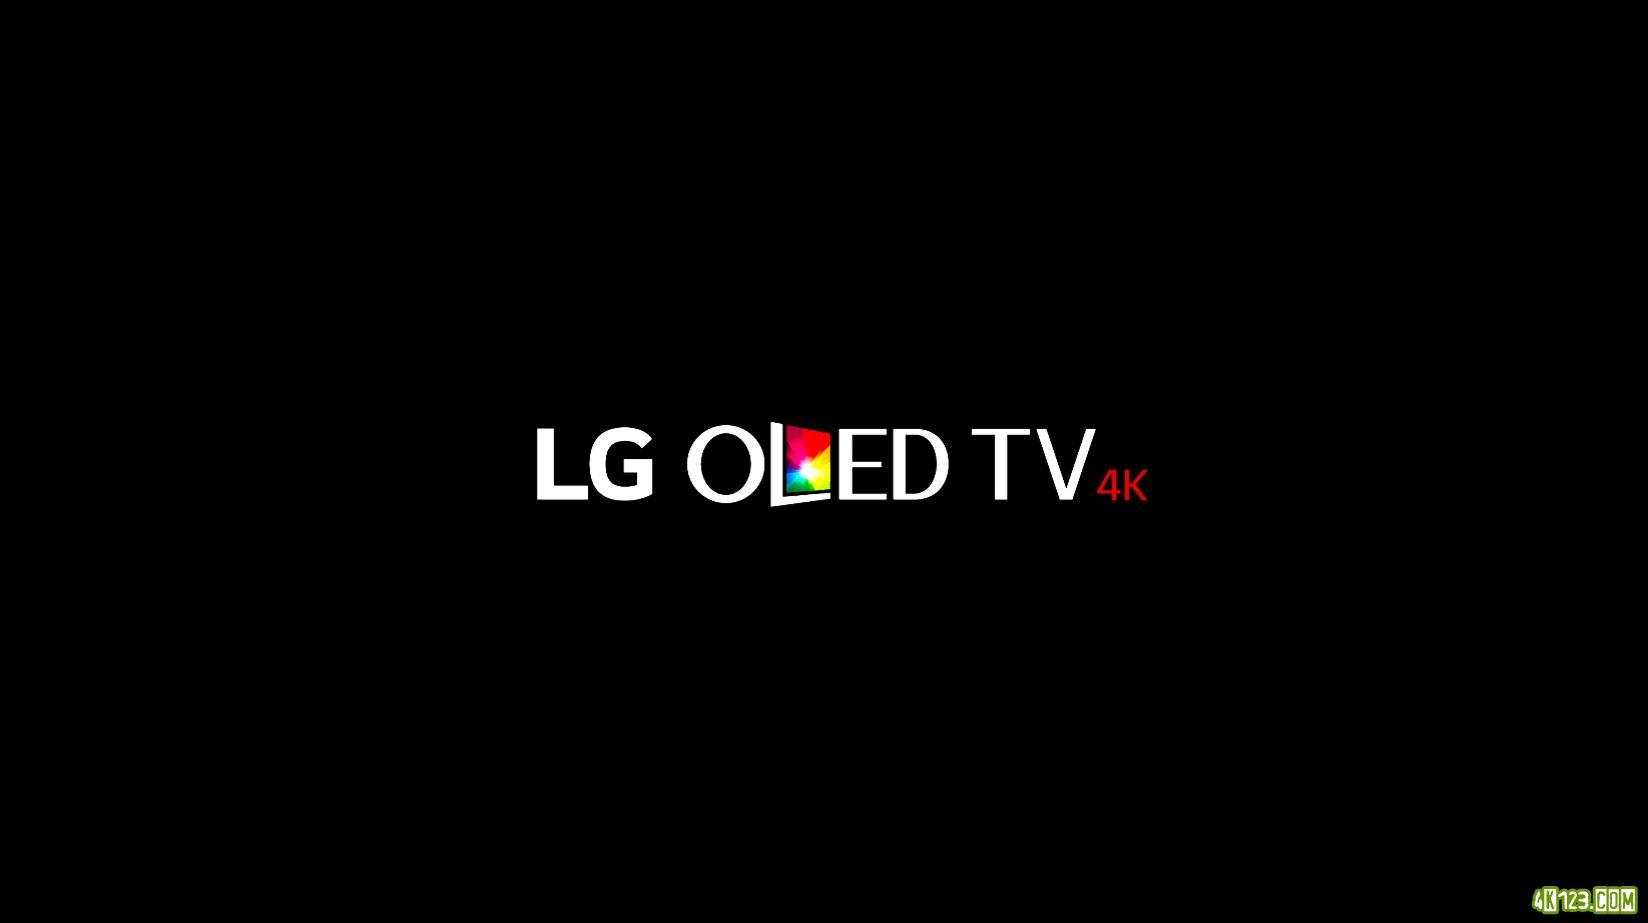 LG.4K.DEMO_Colors.of.Journey-HDR.ts_12.jpg